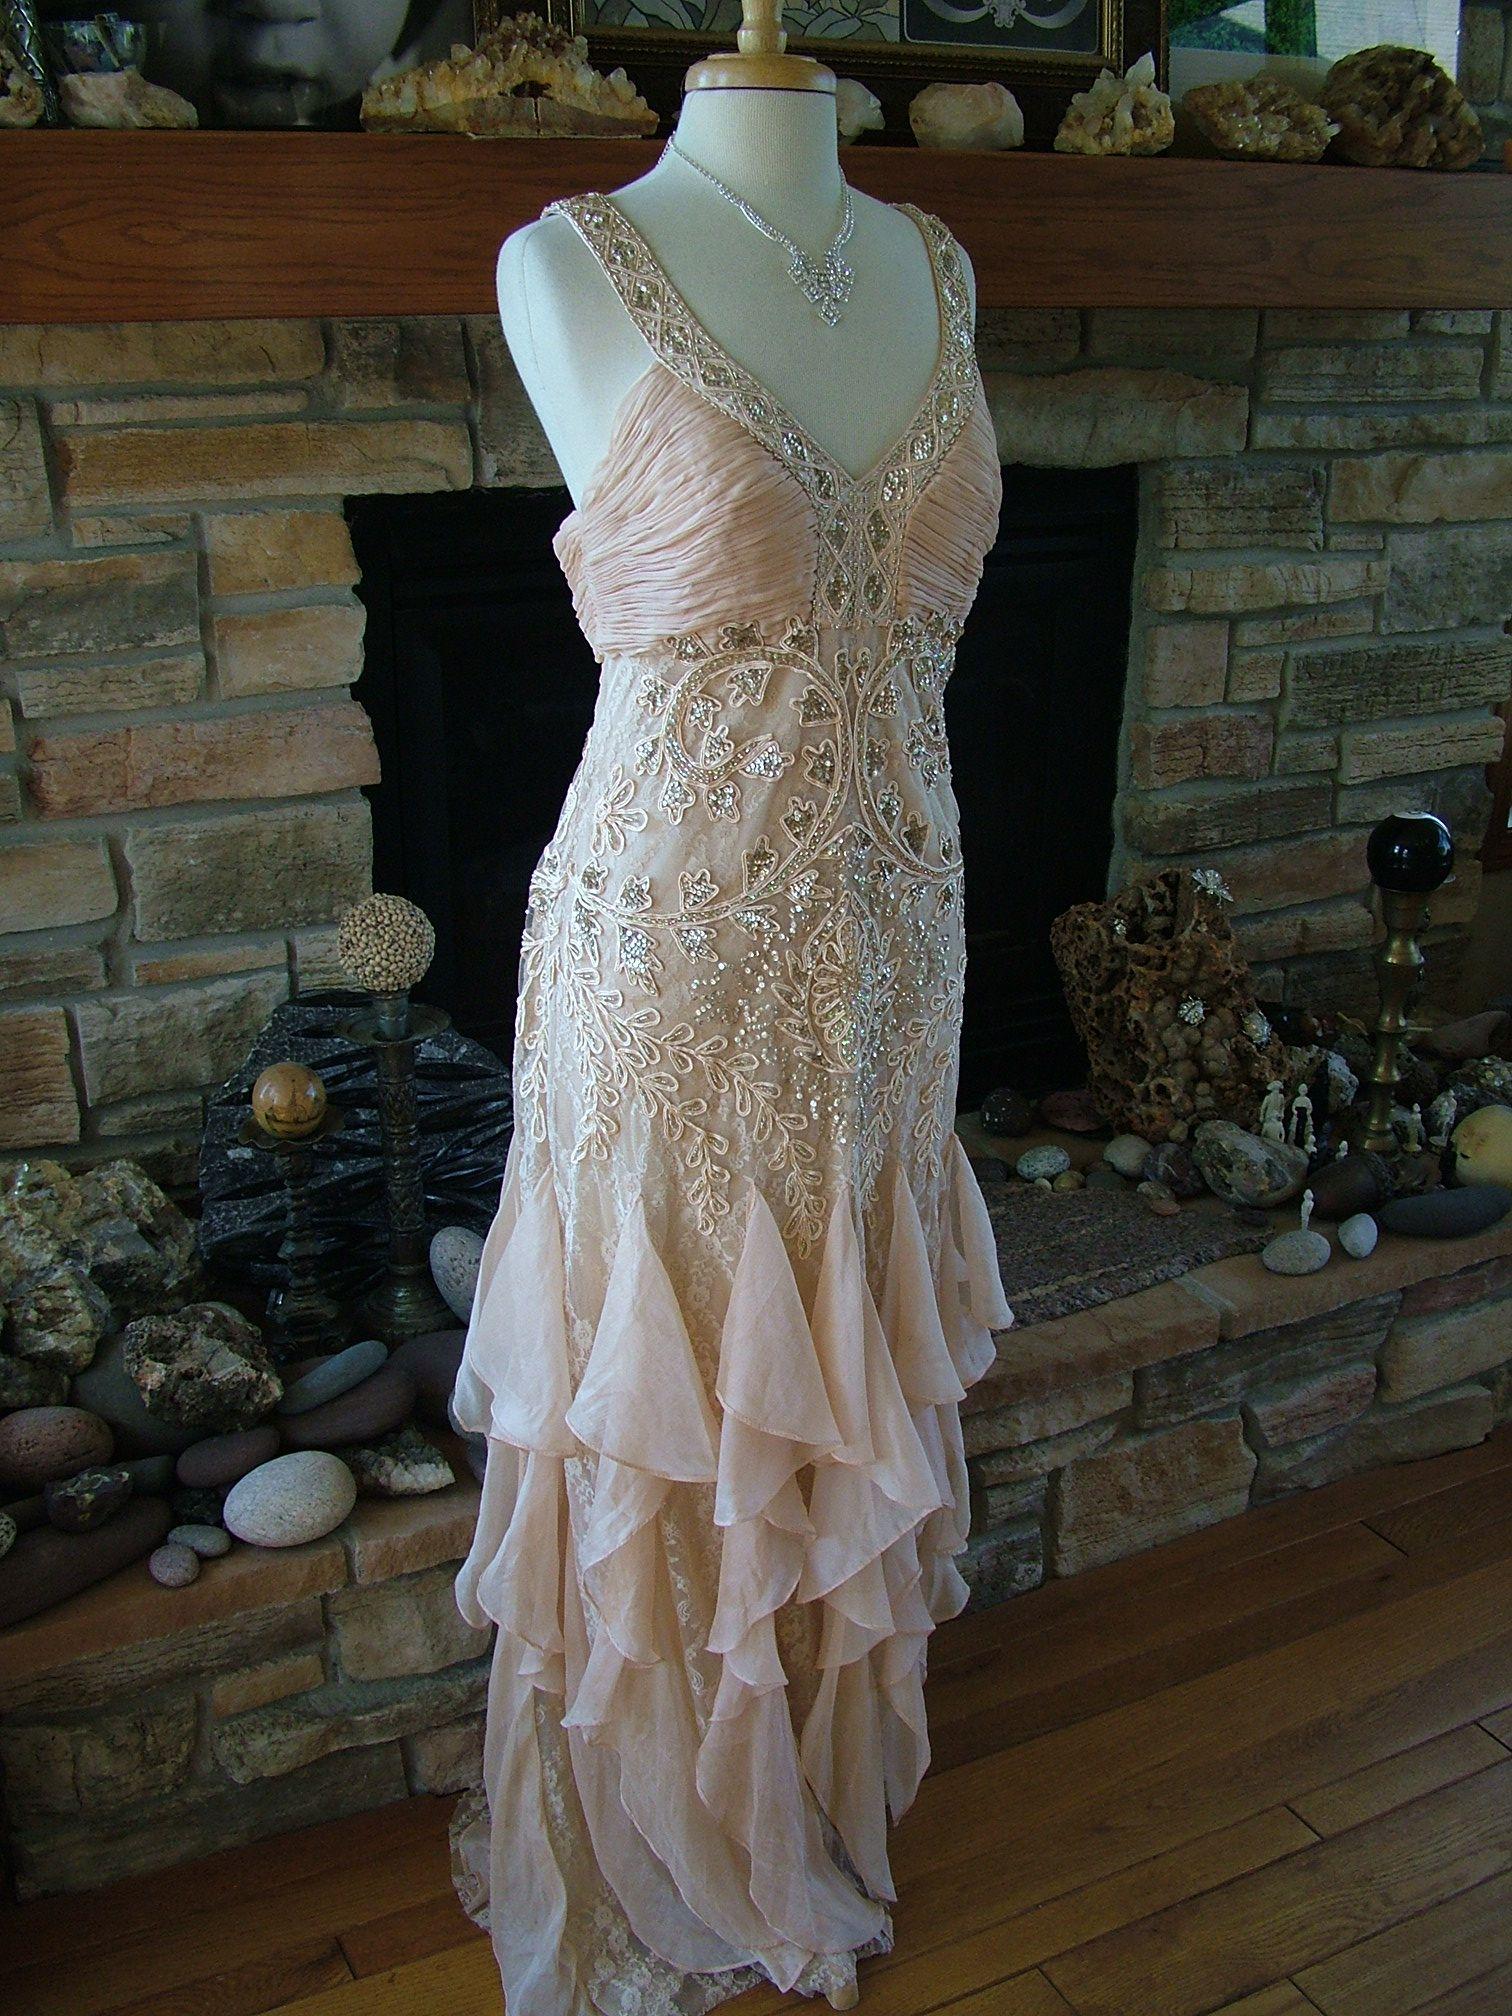 Deco Wedding Dress great gatsby 1920s inspired wedding